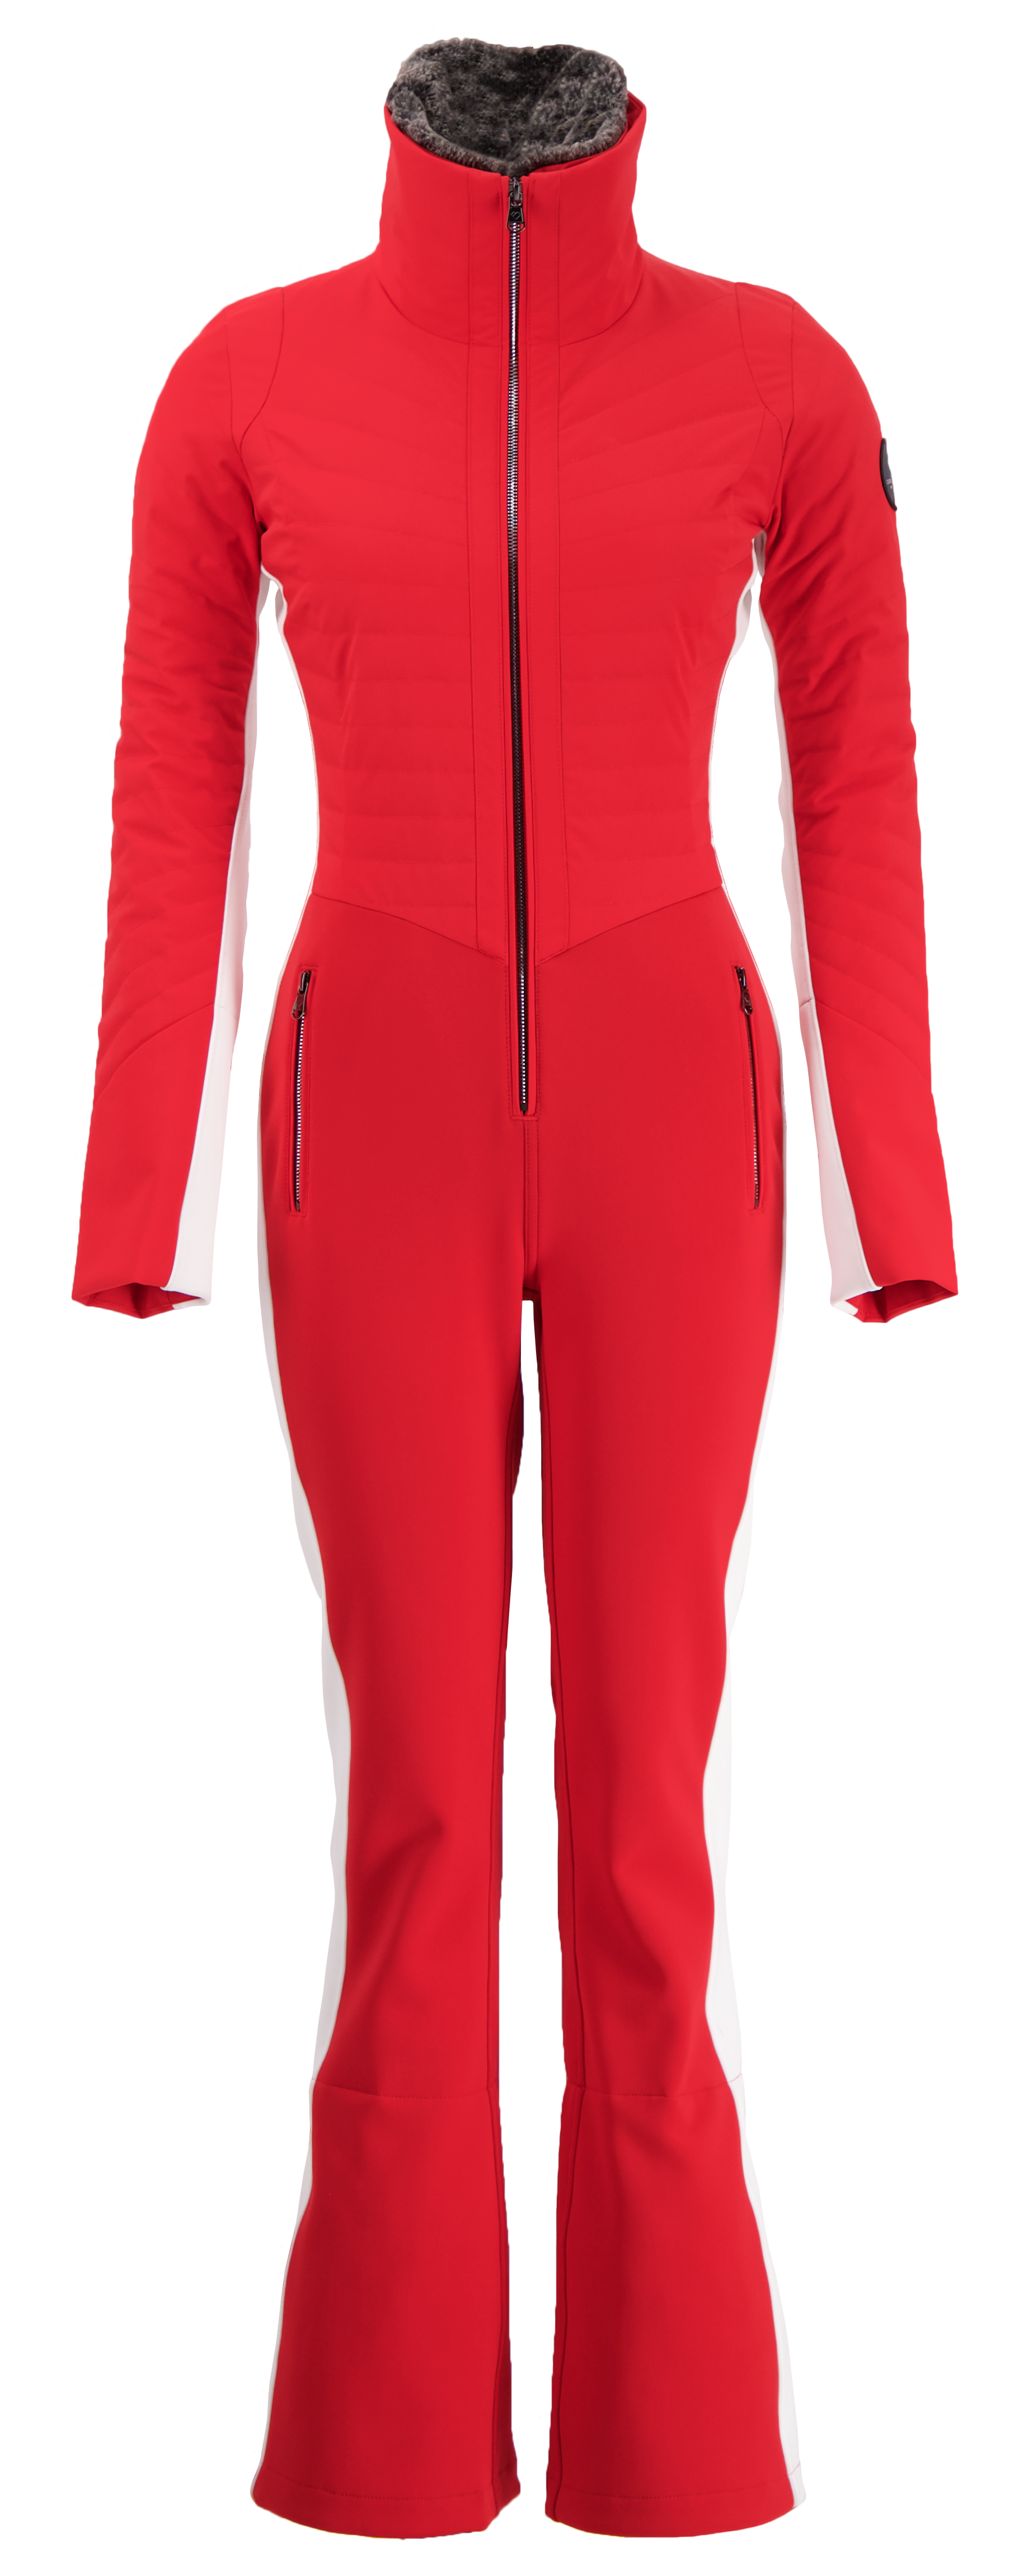 The 2021 Dalbello Panterra 120 men's comfort ski boot